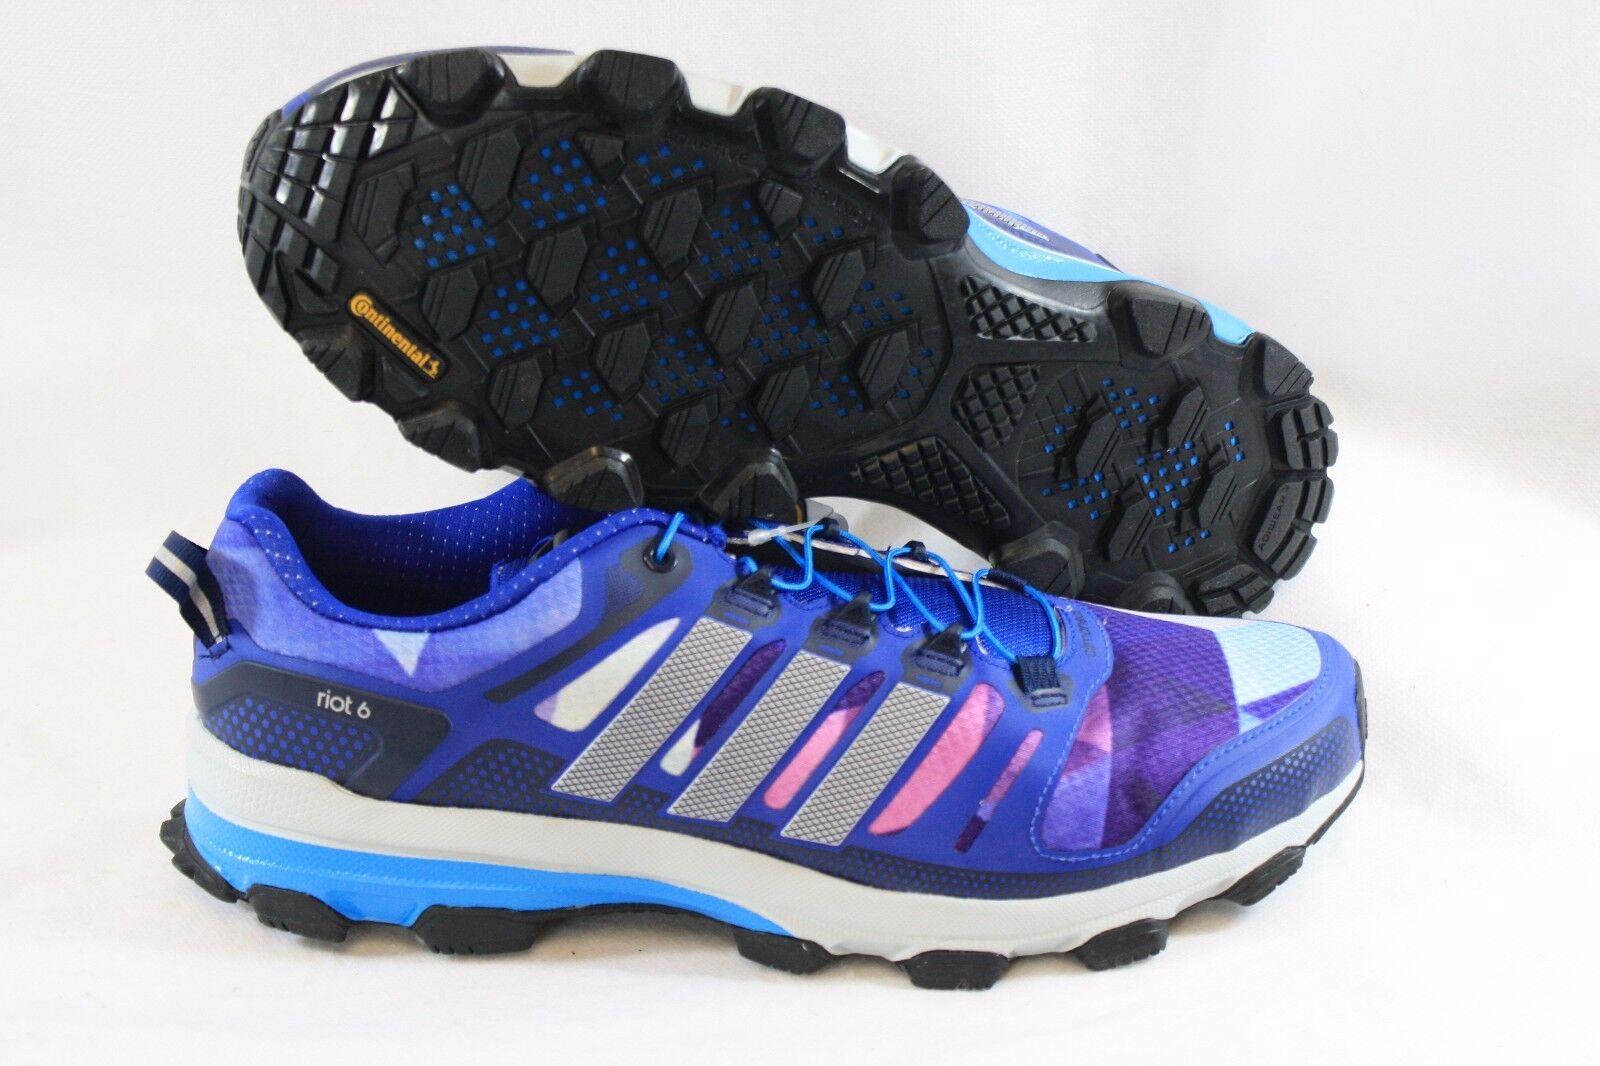 NEW Uomo Sz 9 ADIDAS Supernova Riot 6 B26545 Blue Purple Running  Shoes